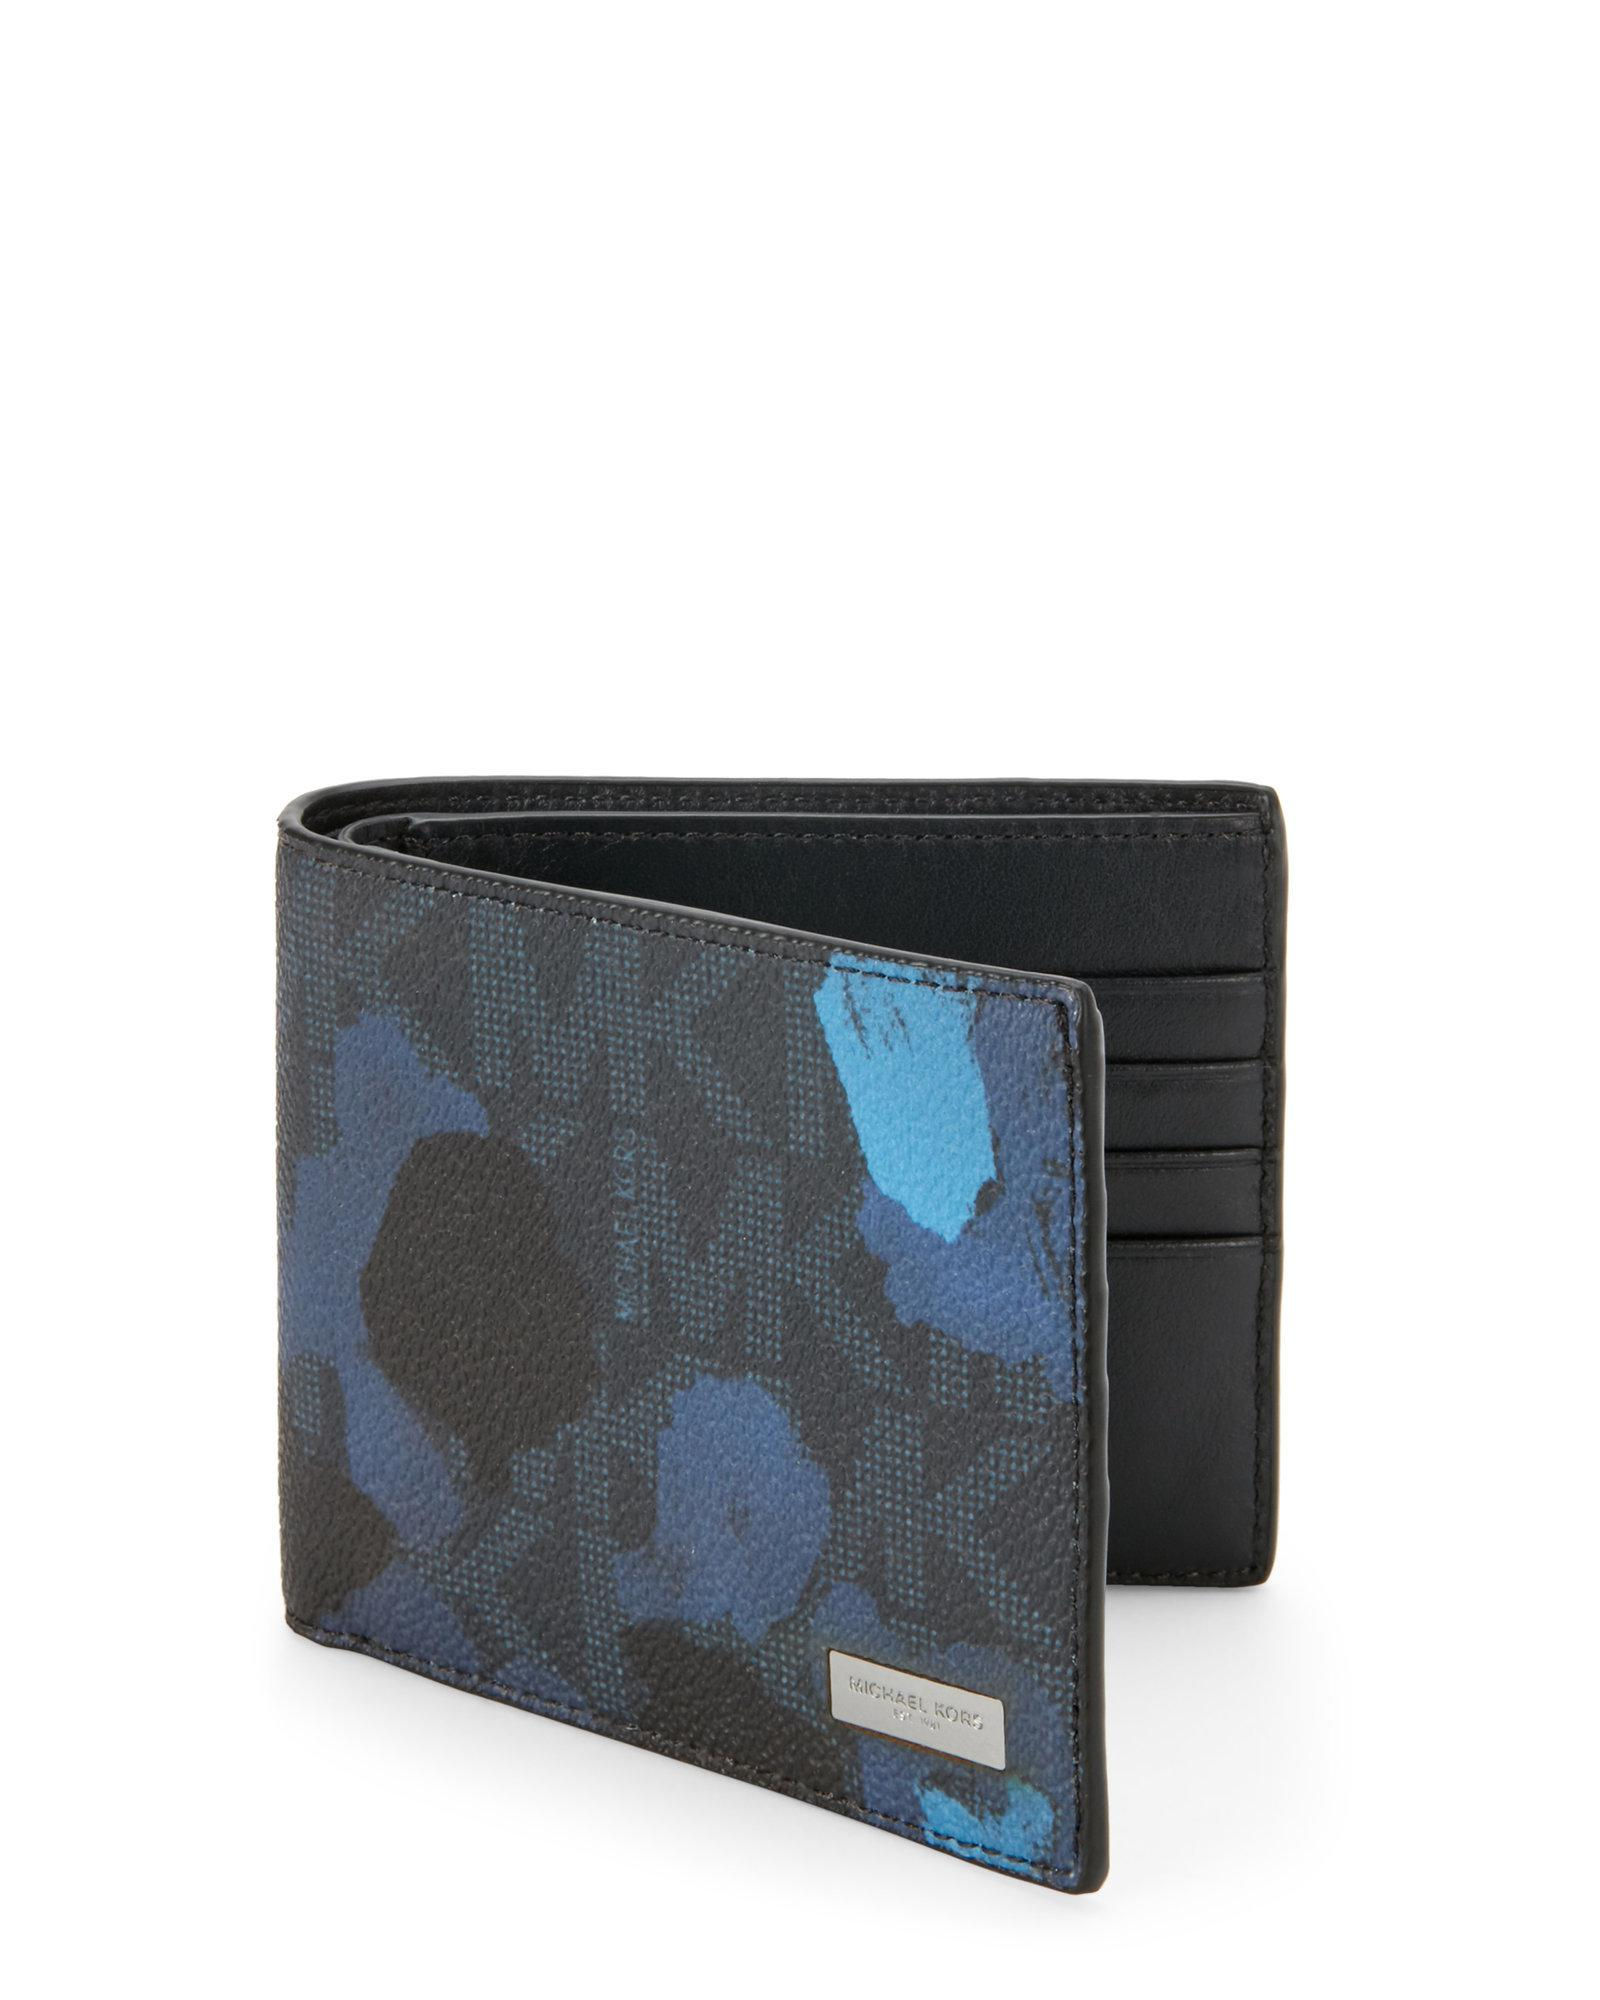 7ca051060b62 Lyst - Michael Kors Jet Set Painterly Camo Billfold Wallet in Blue ...